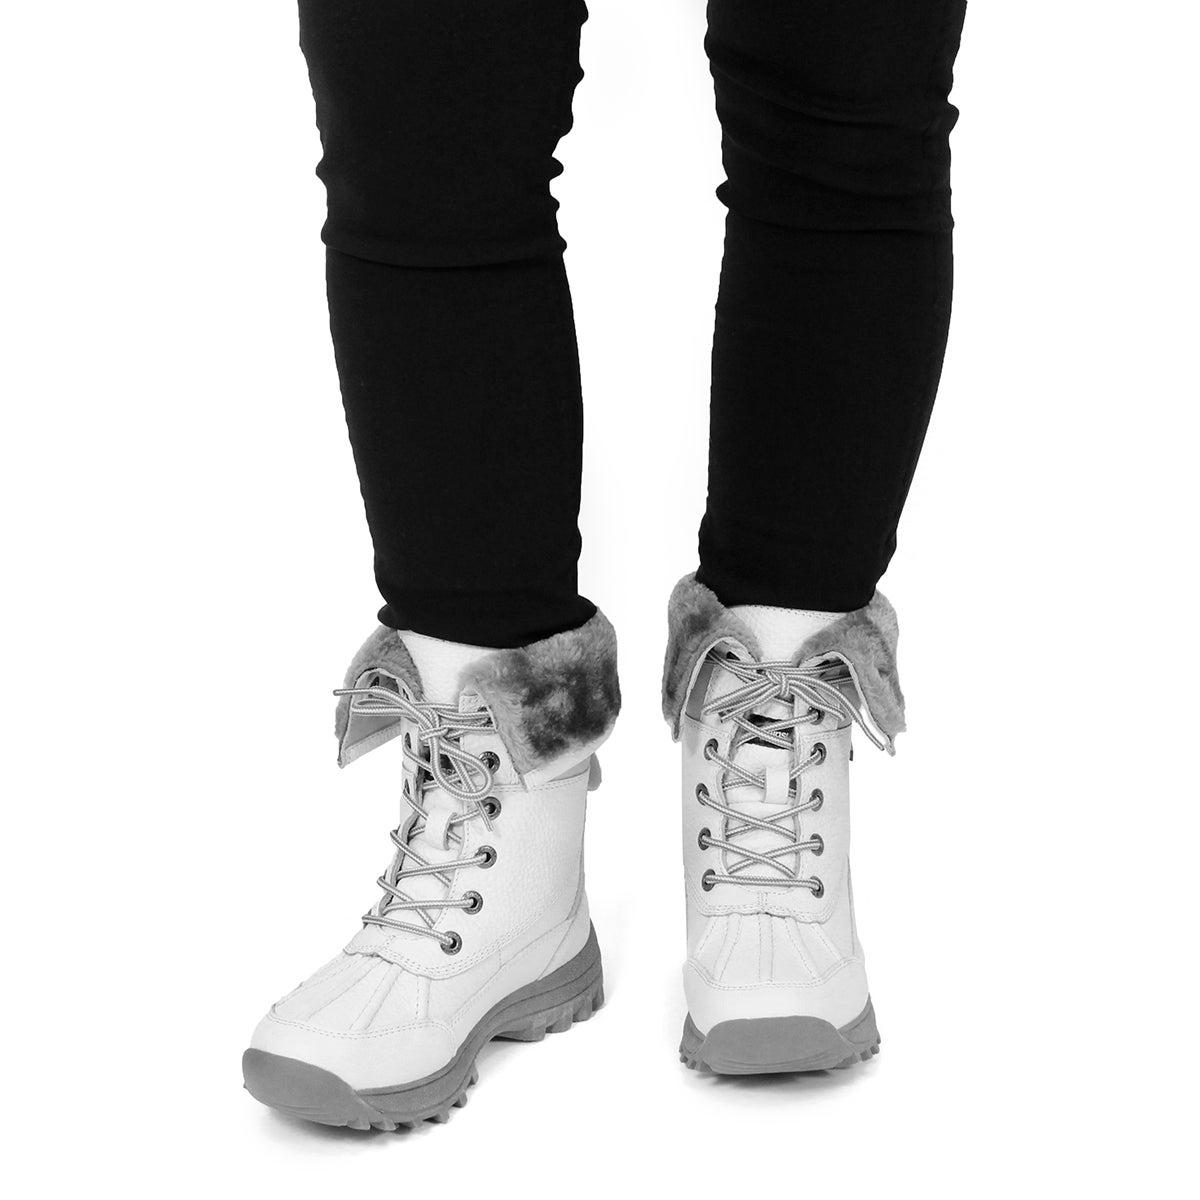 Lds Shakira2 ice w/p foldover cuff